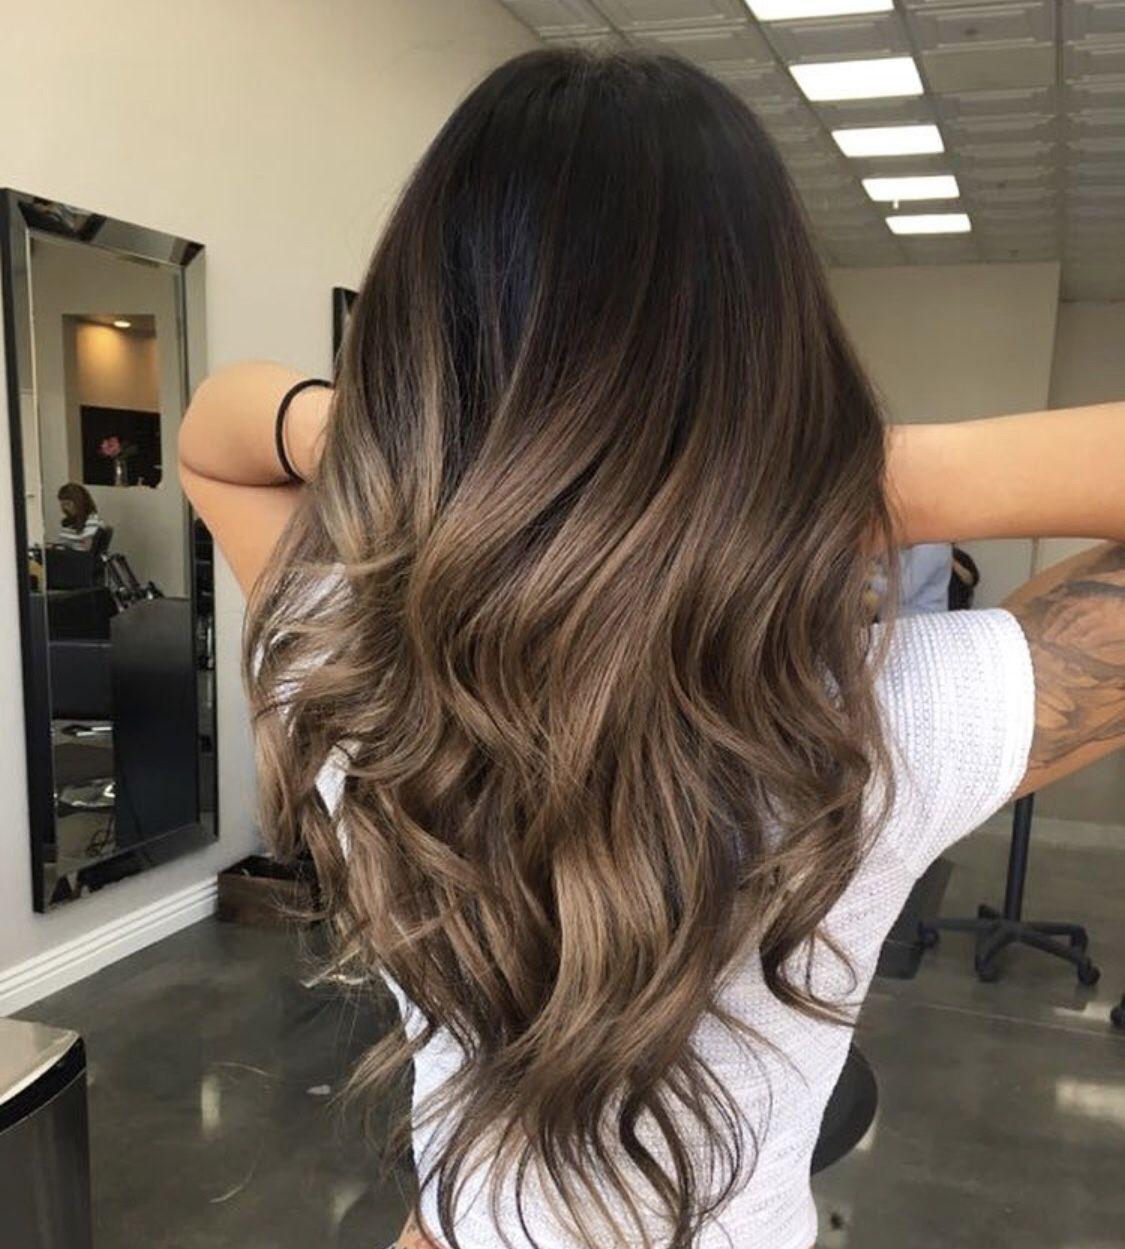 Hair Inspiration 2019-04-29 04:10:28